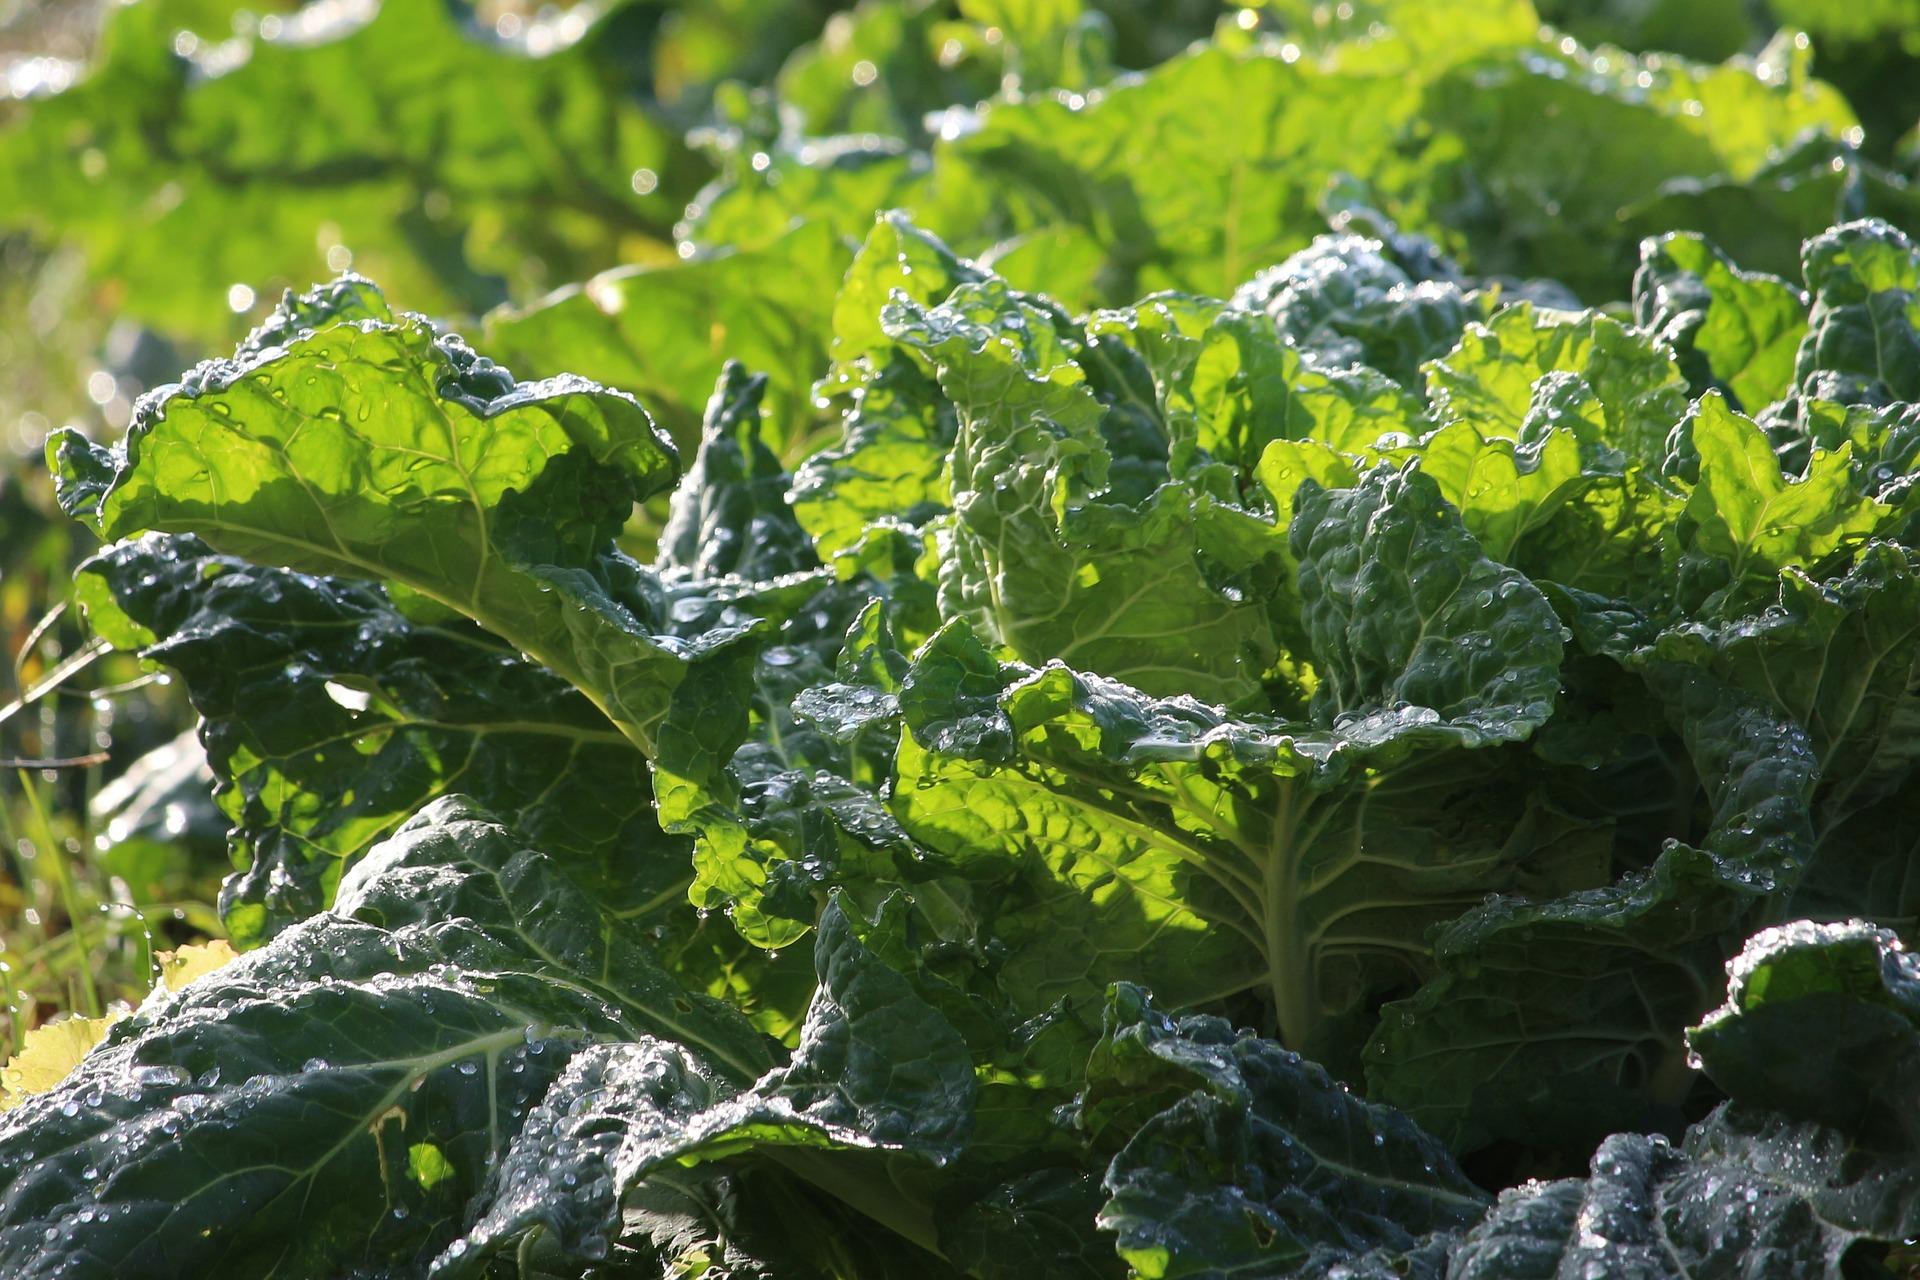 Dark Leafy Green Vegetables